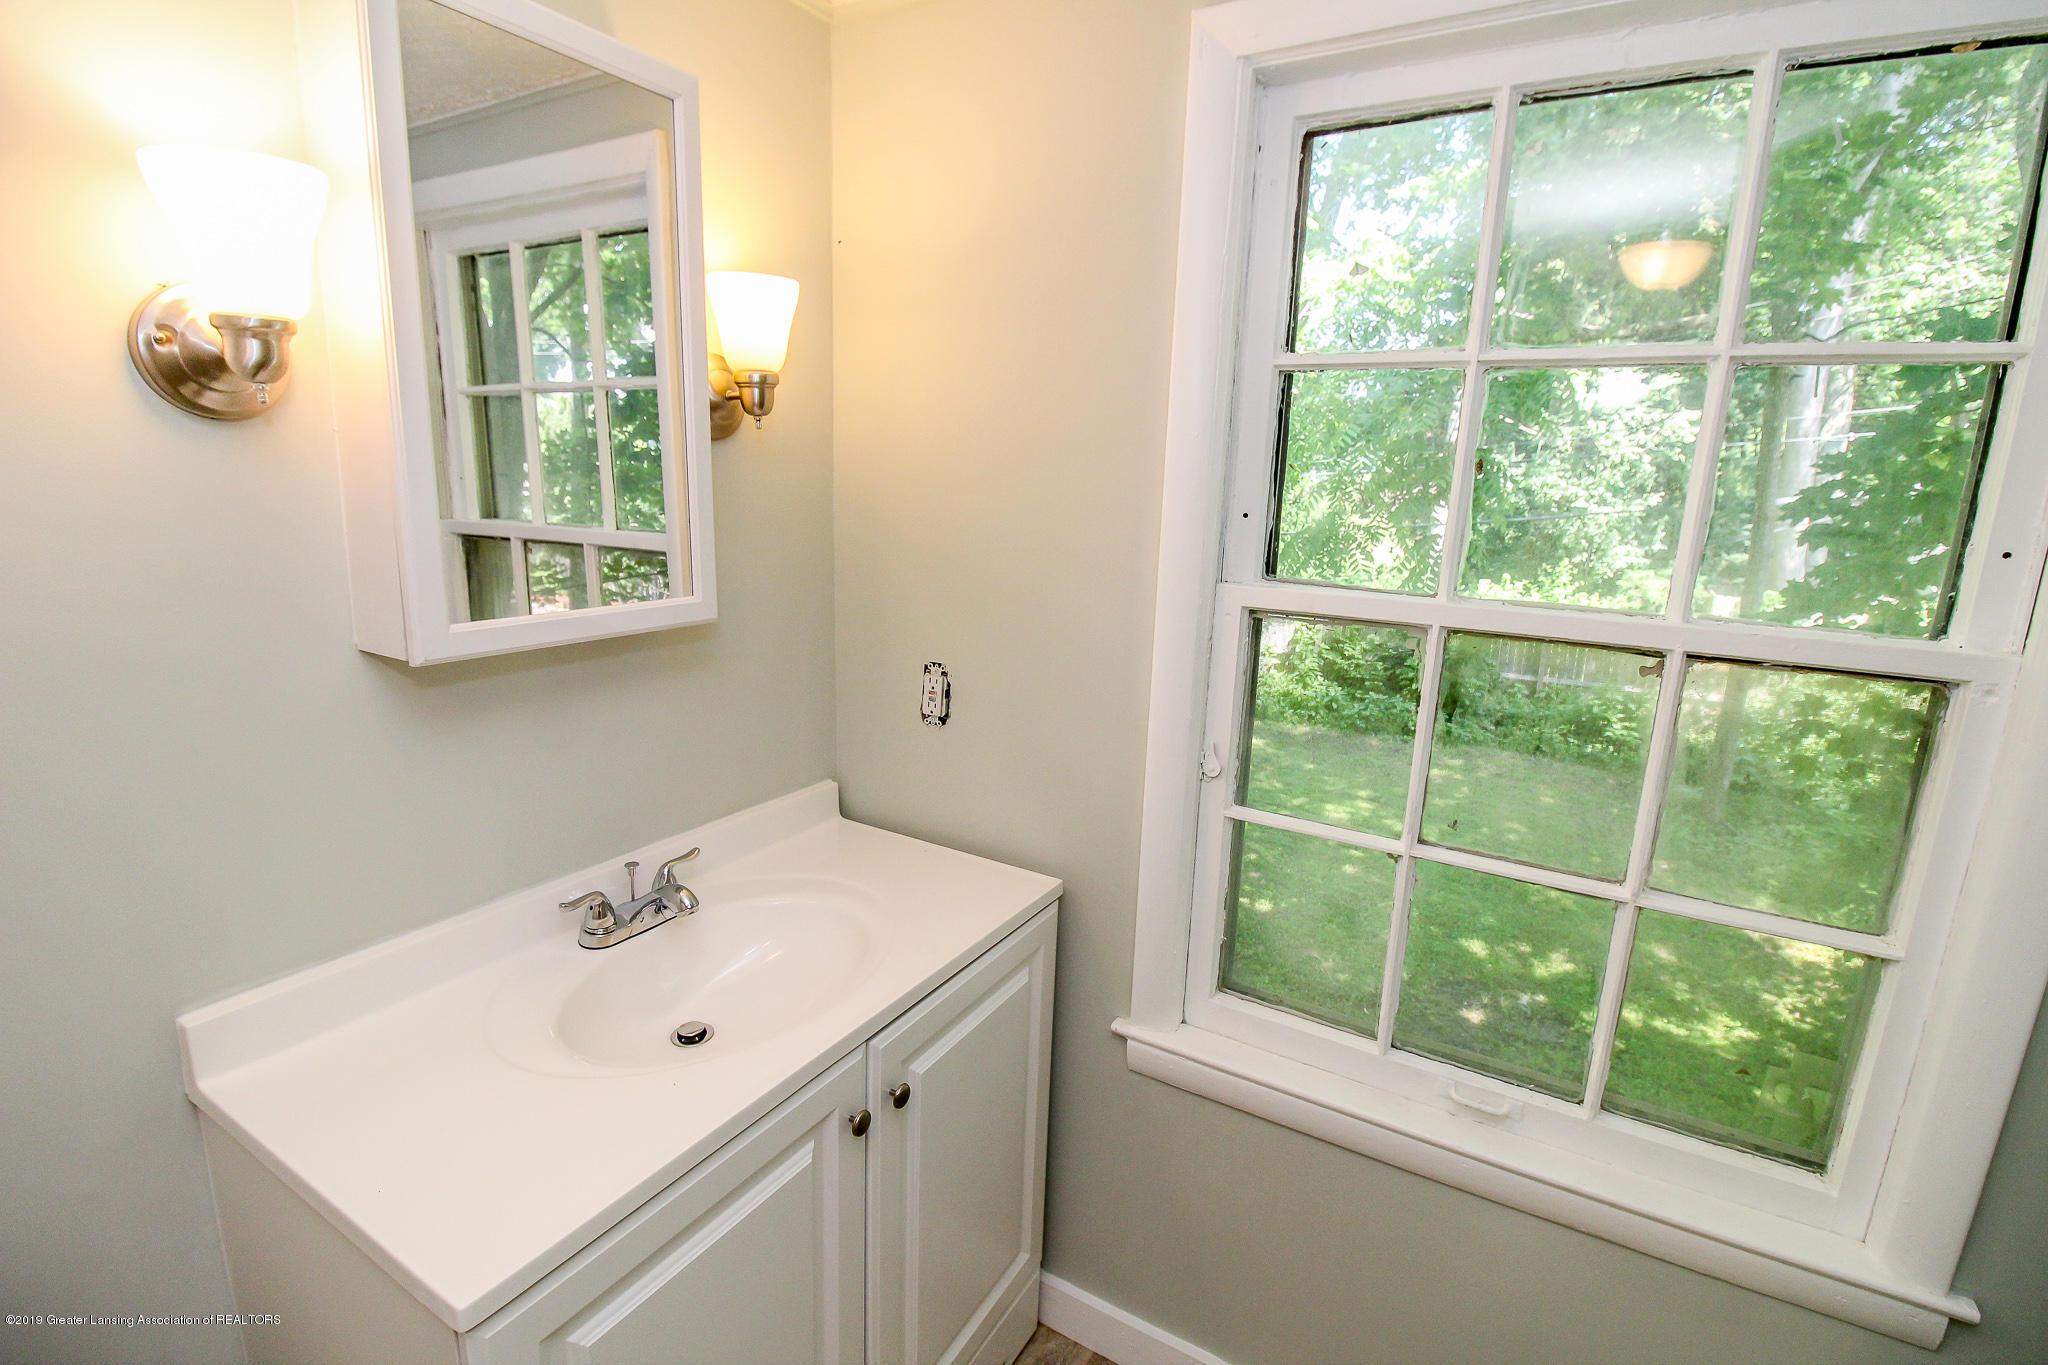 124 Northlawn Ave - 34 Second Floor Bathroom 3 - 27